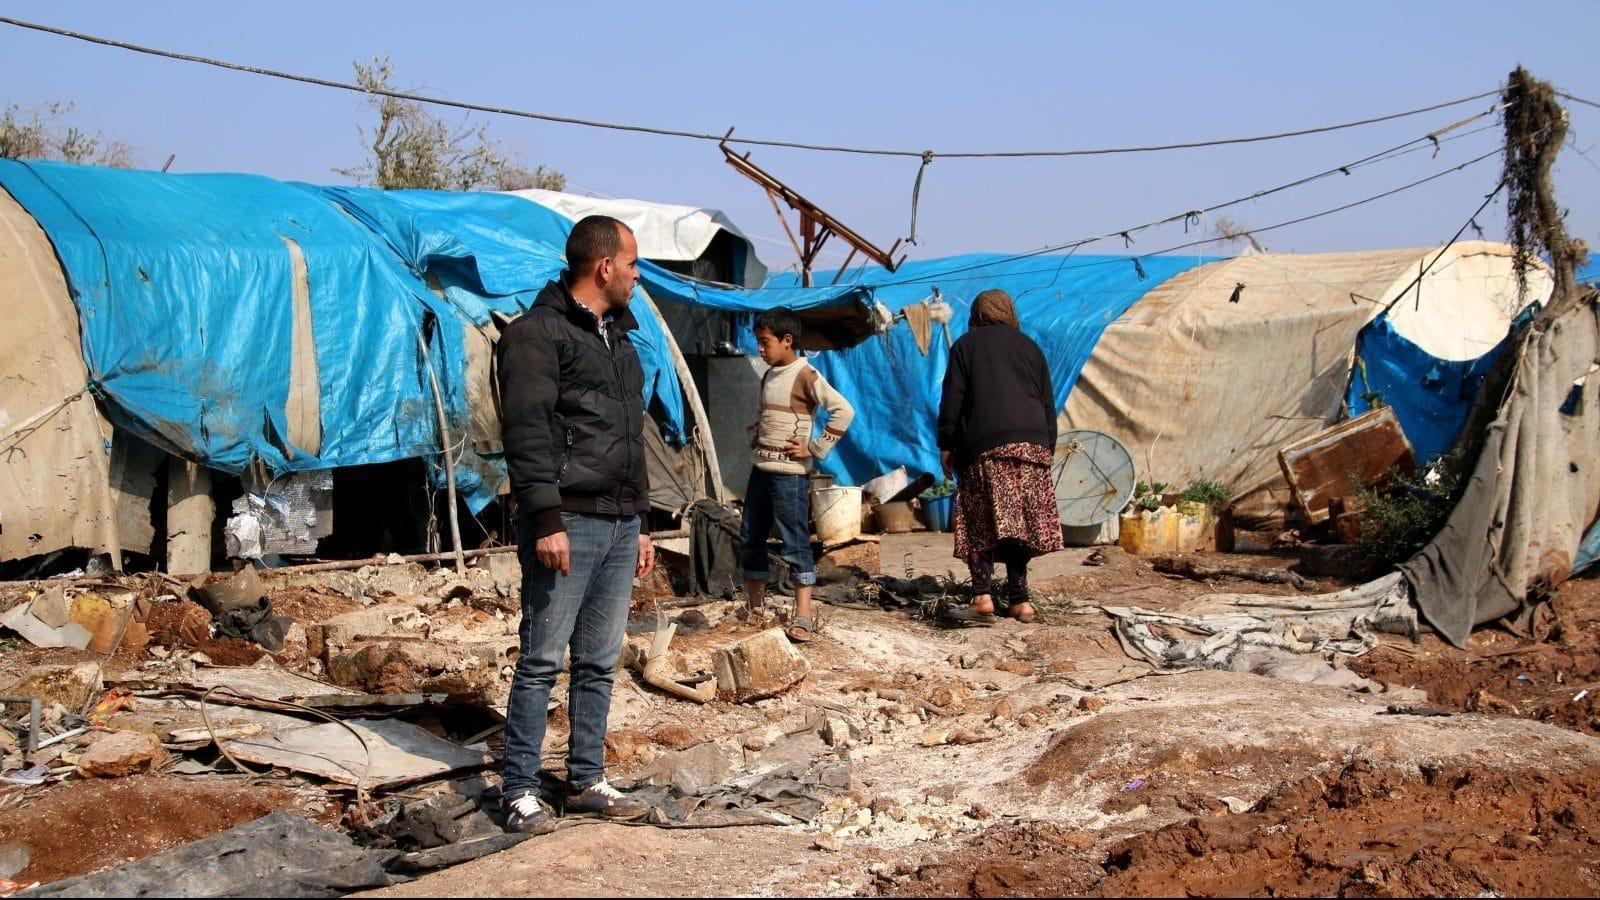 Kosovo ISIS Women and Children 'Escape Syria Camps' | Balkan Insight